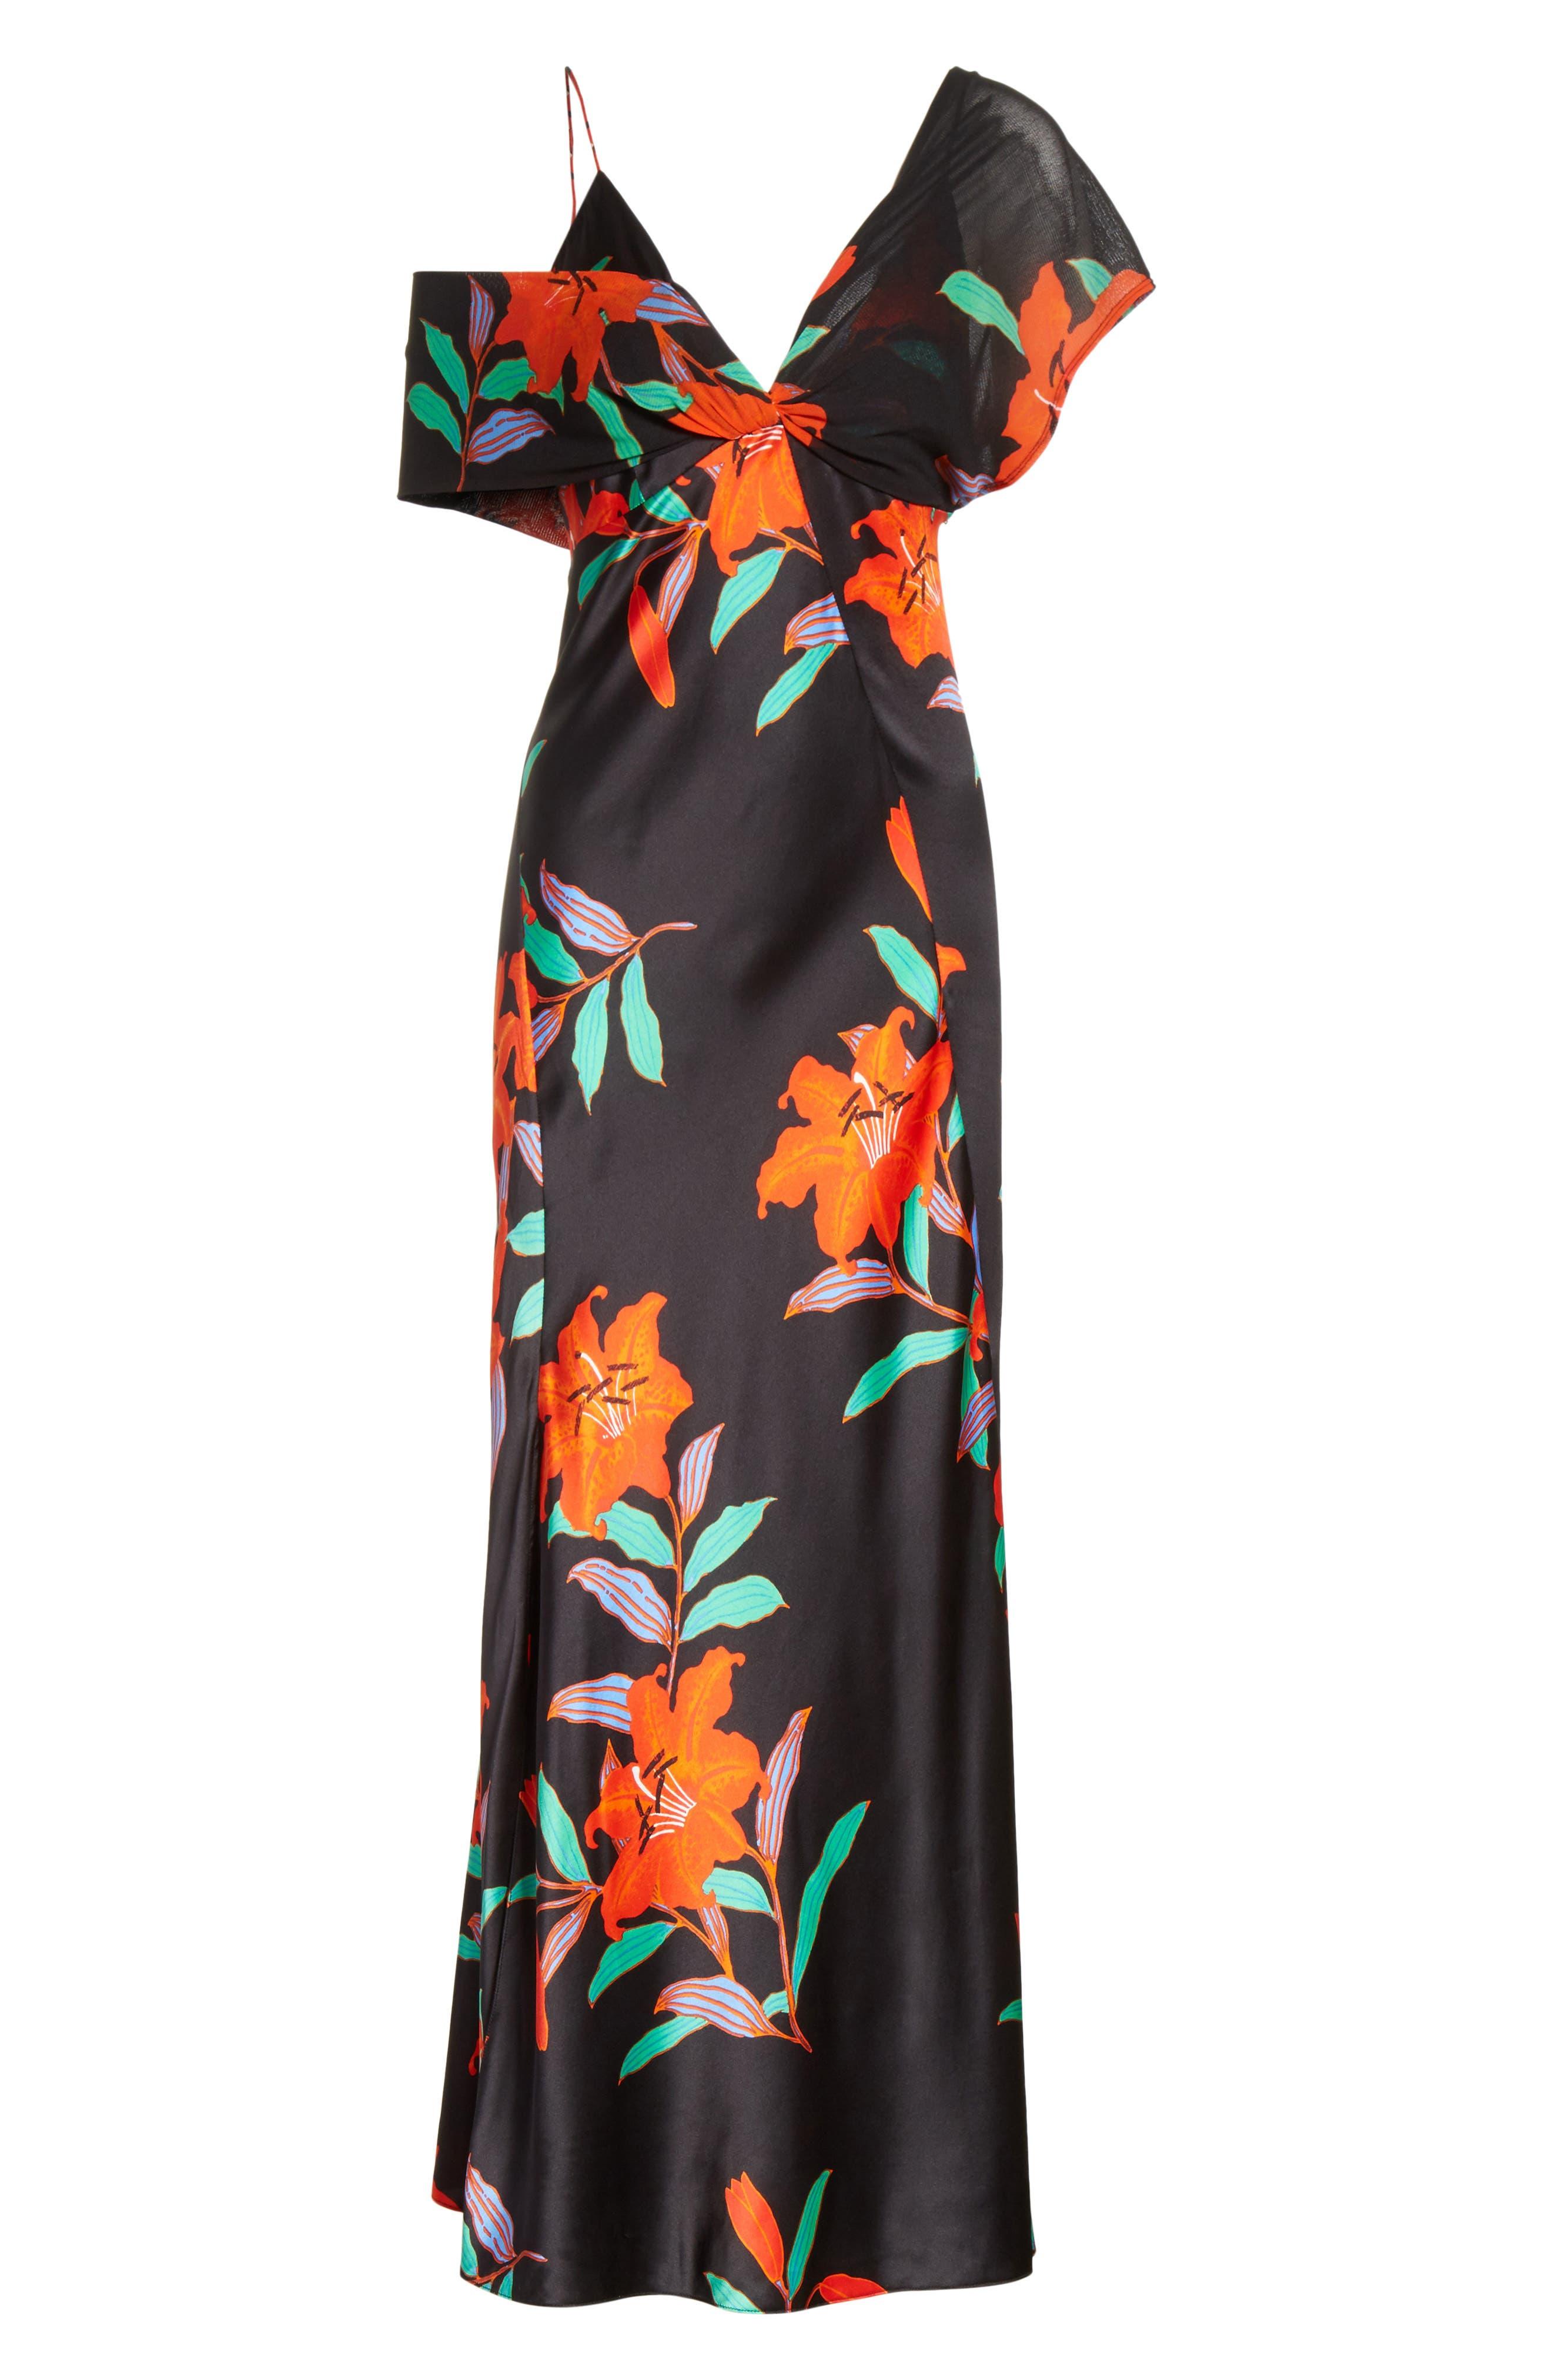 Diane von Furstenberg Asymmetrical Knotted Gown,                             Alternate thumbnail 6, color,                             001